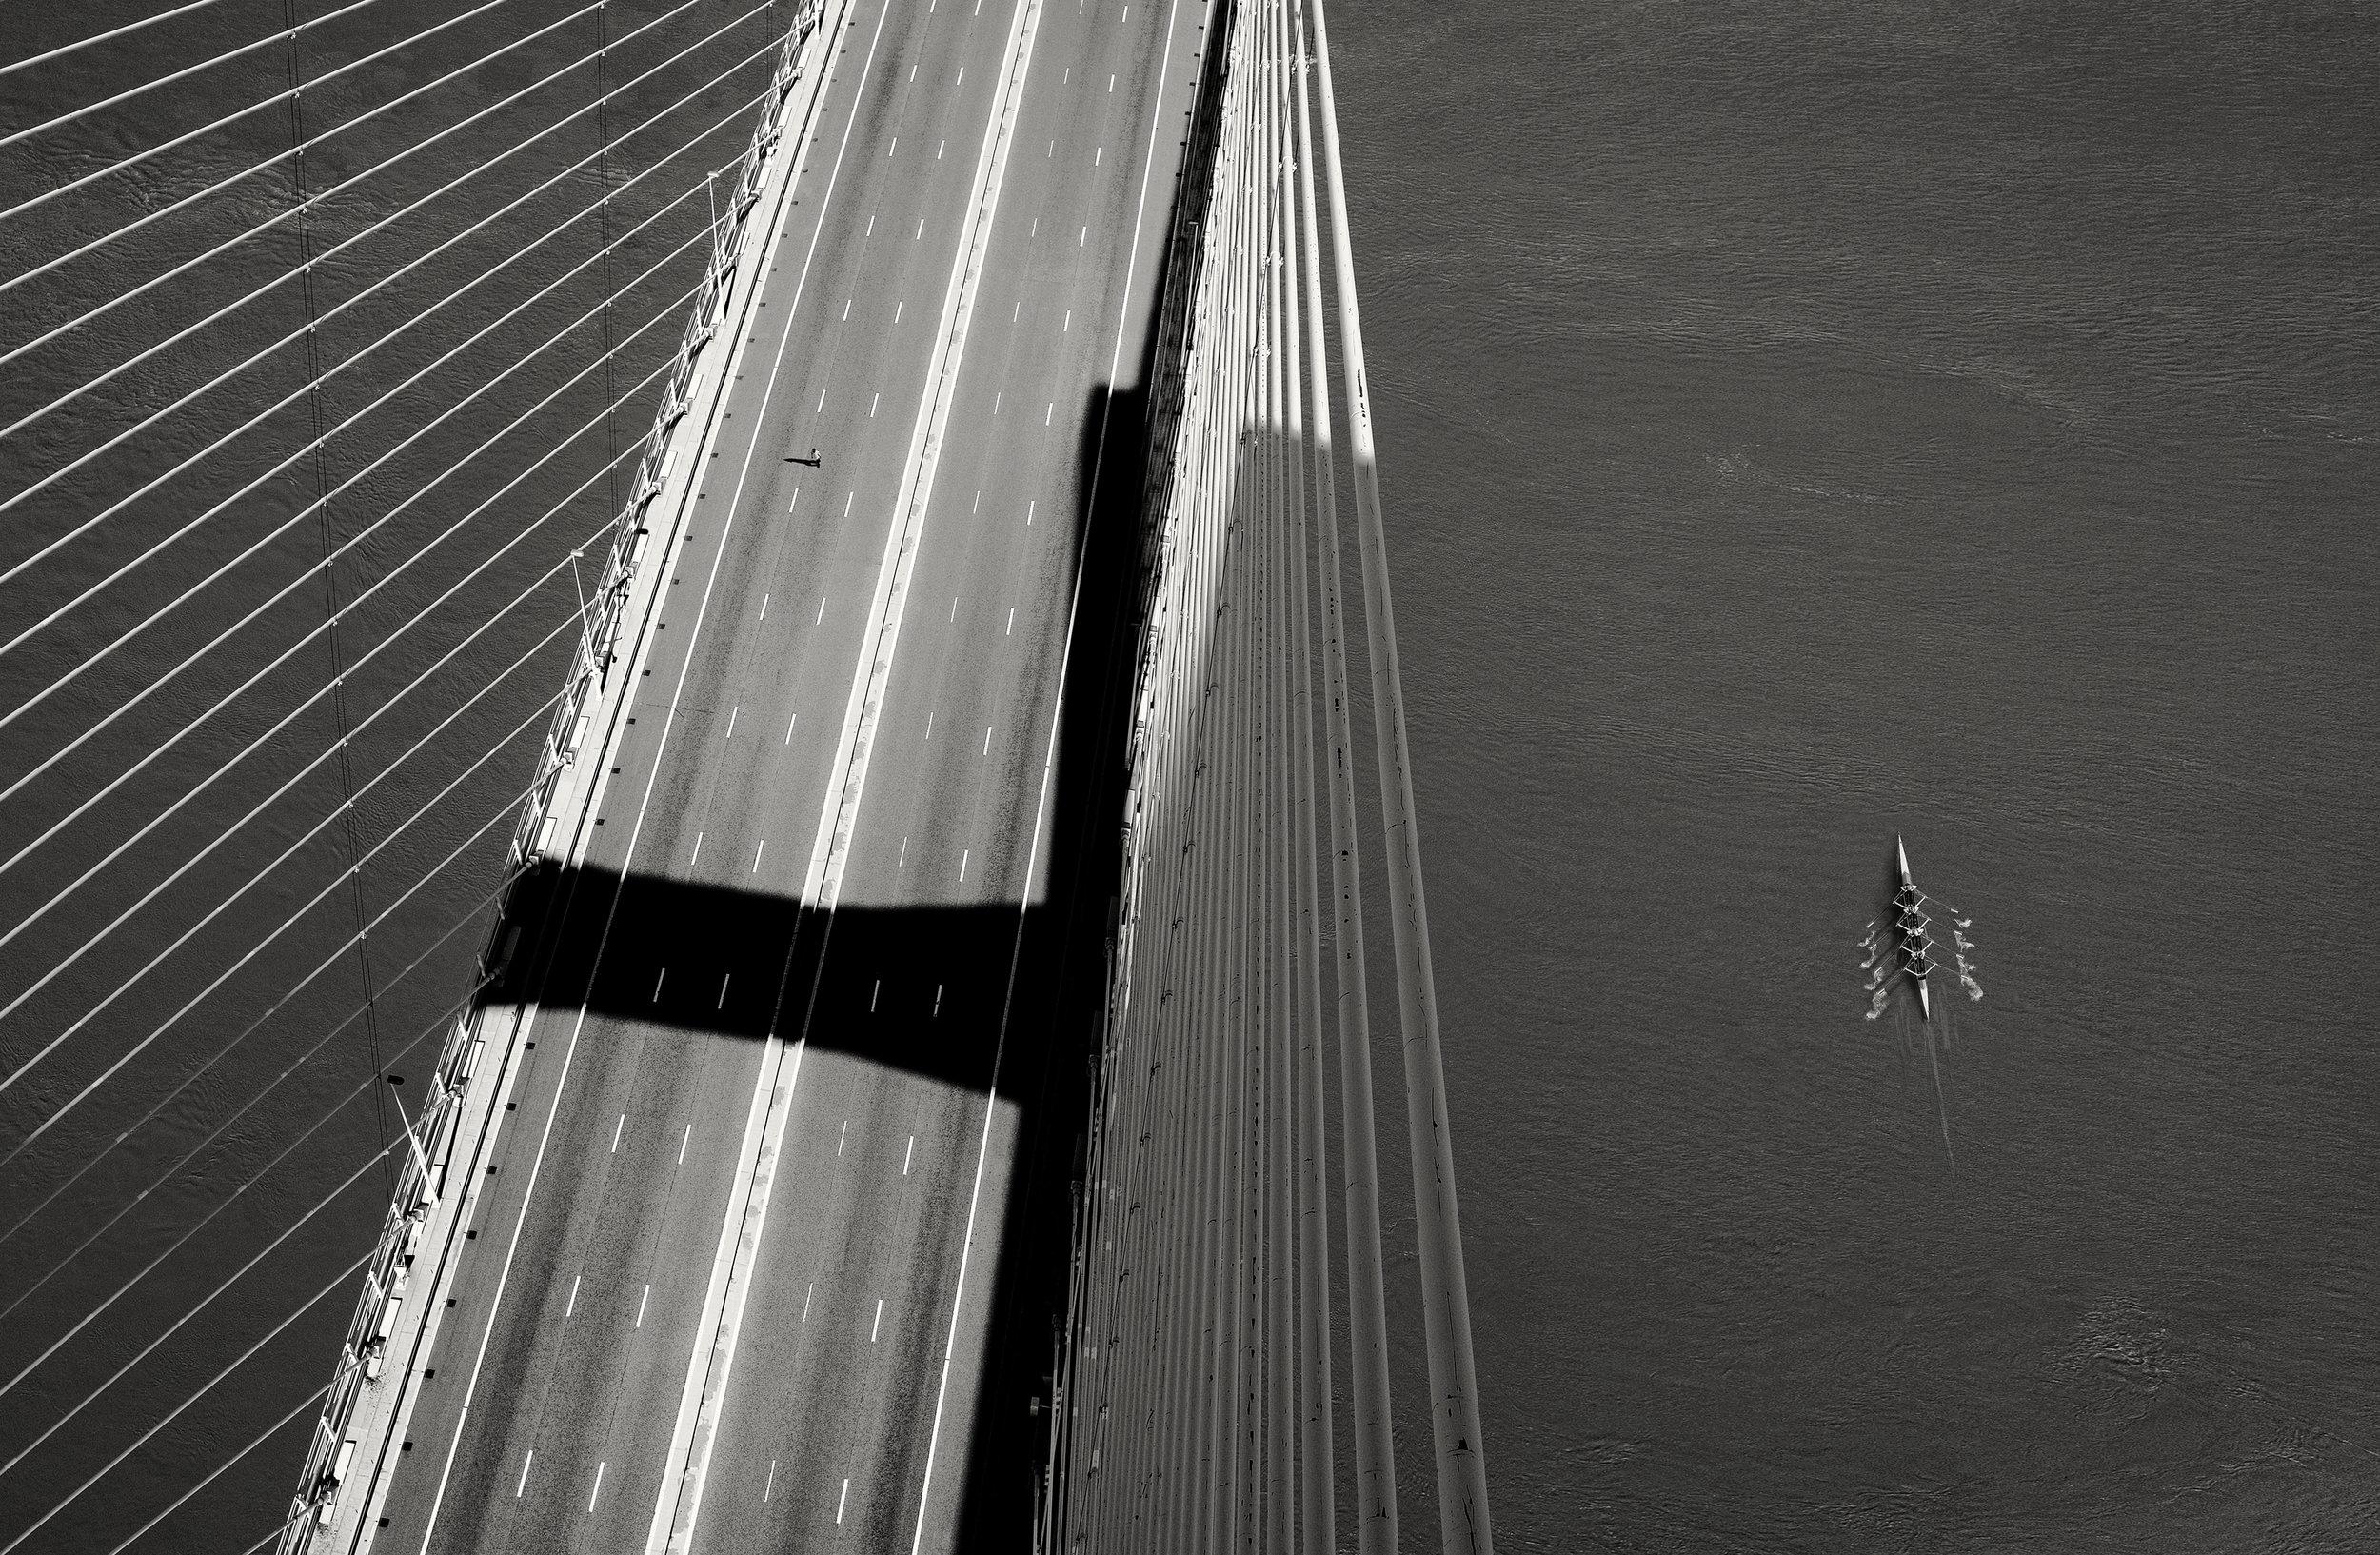 George Kavanagh rowers and bridge